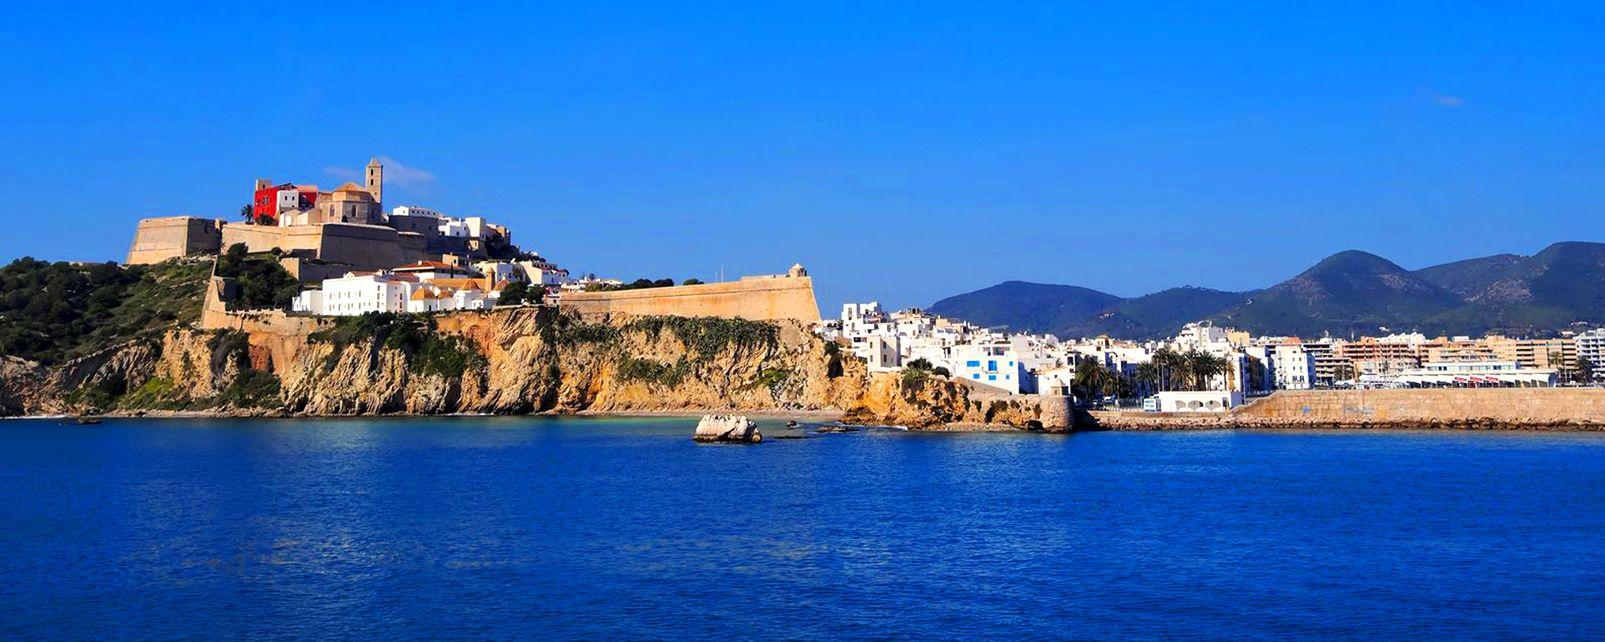 La citadelle d'Eivissa, capitale d'Ibiza , The citadel of Ibiza (Eivissa) , Spain